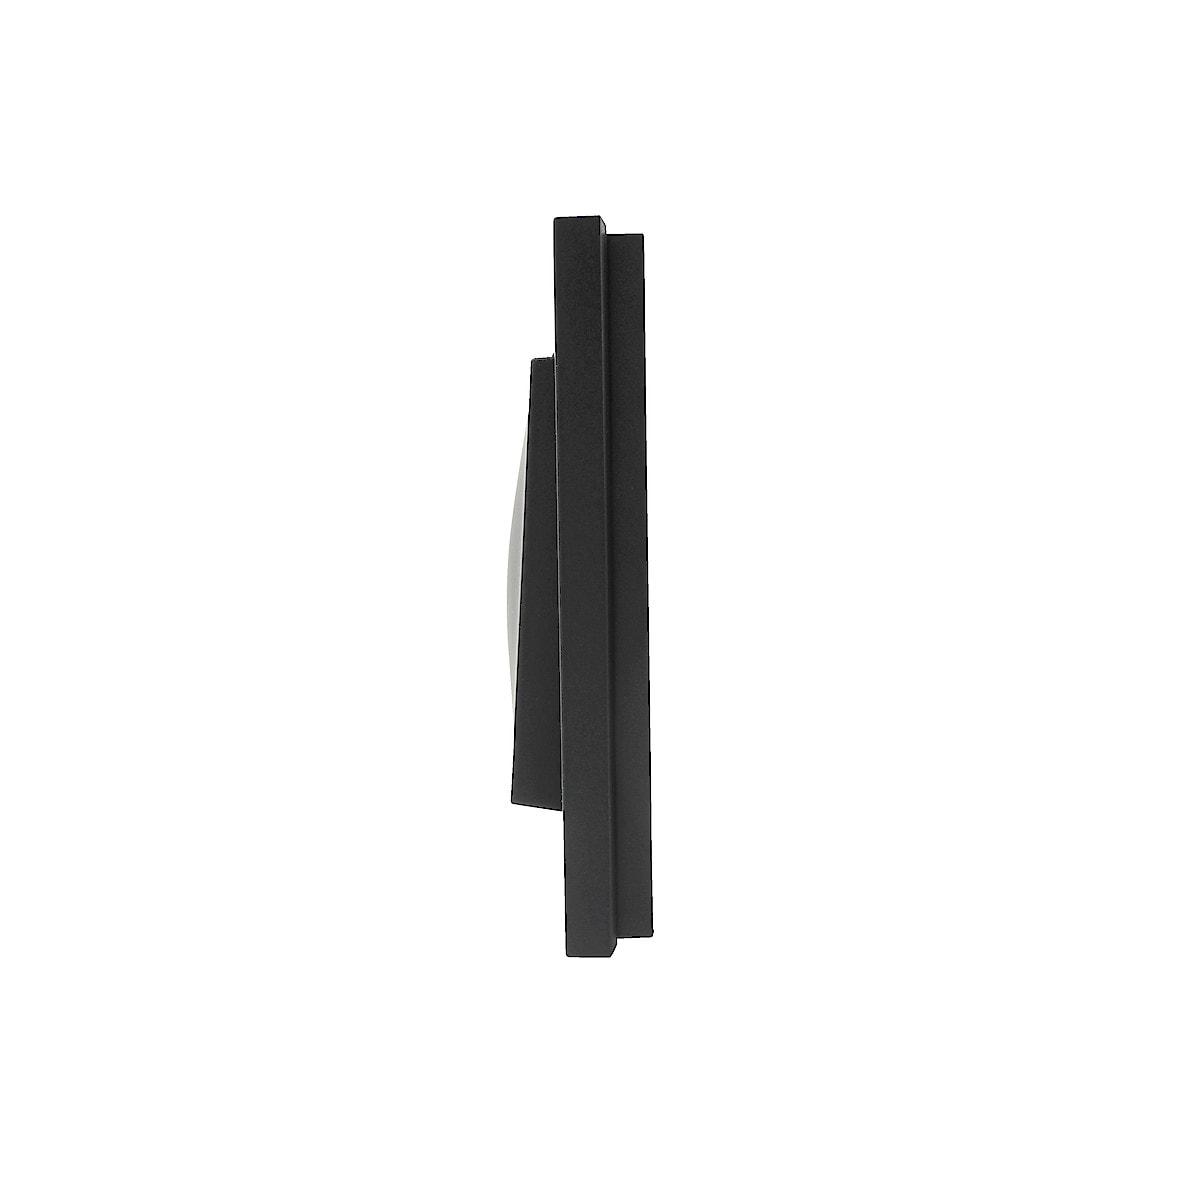 ELKO Plus strømbryter 1-pol/trapp